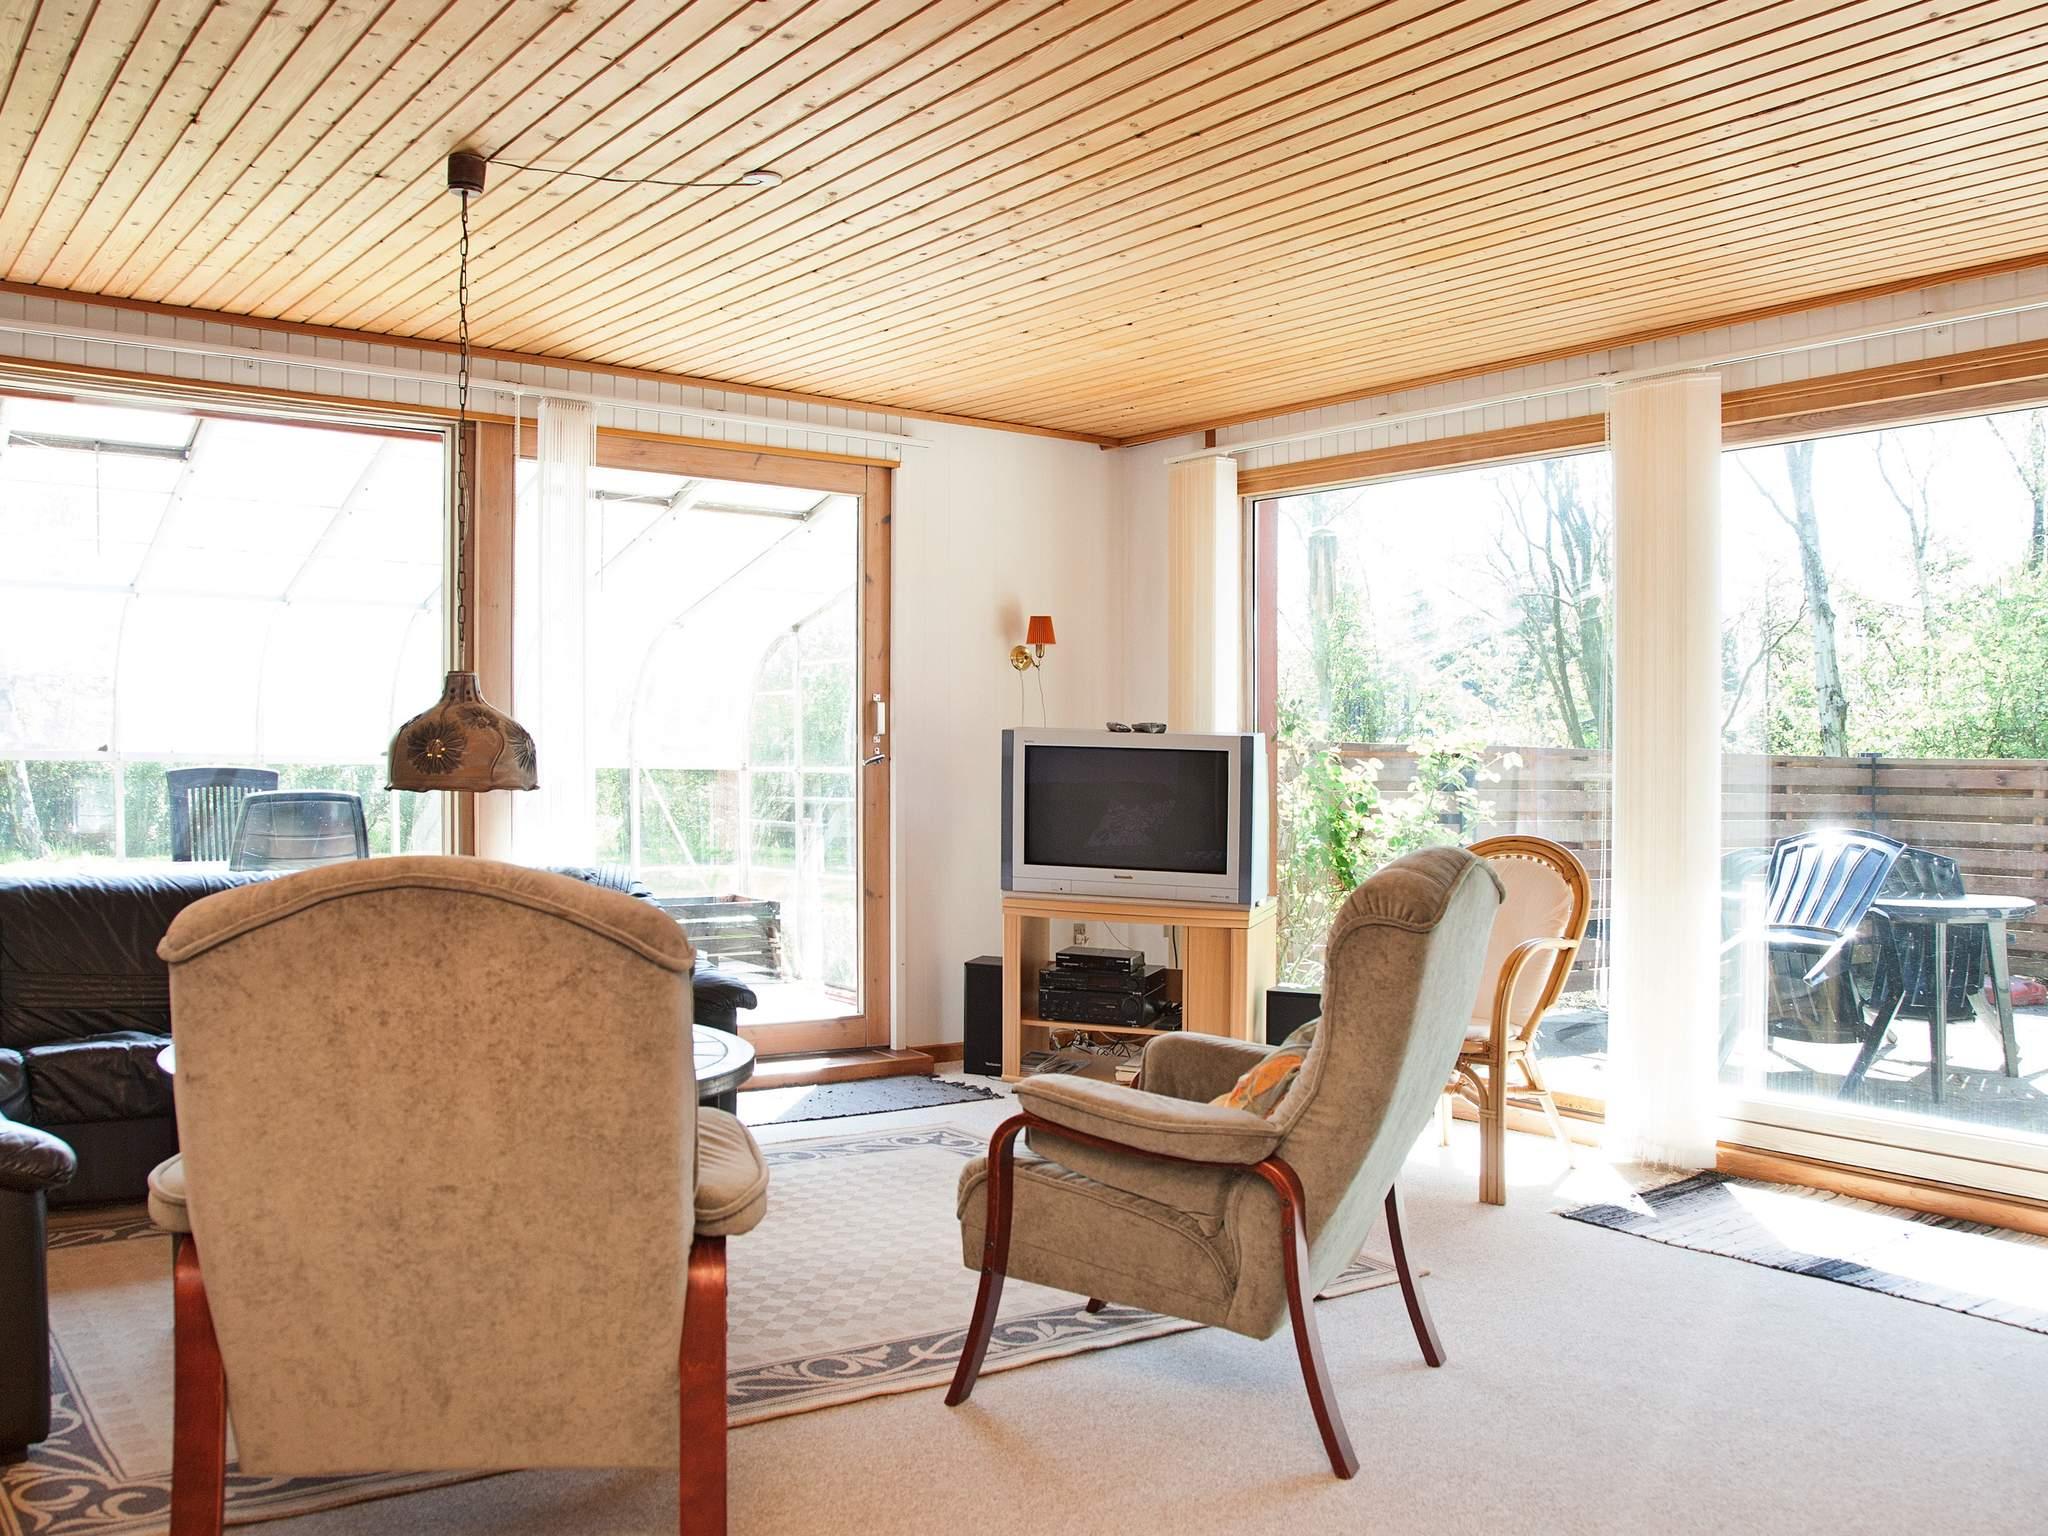 Maison de vacances Næsby Strand/Lolland (83279), Næsby, , Lolland, Danemark, image 5